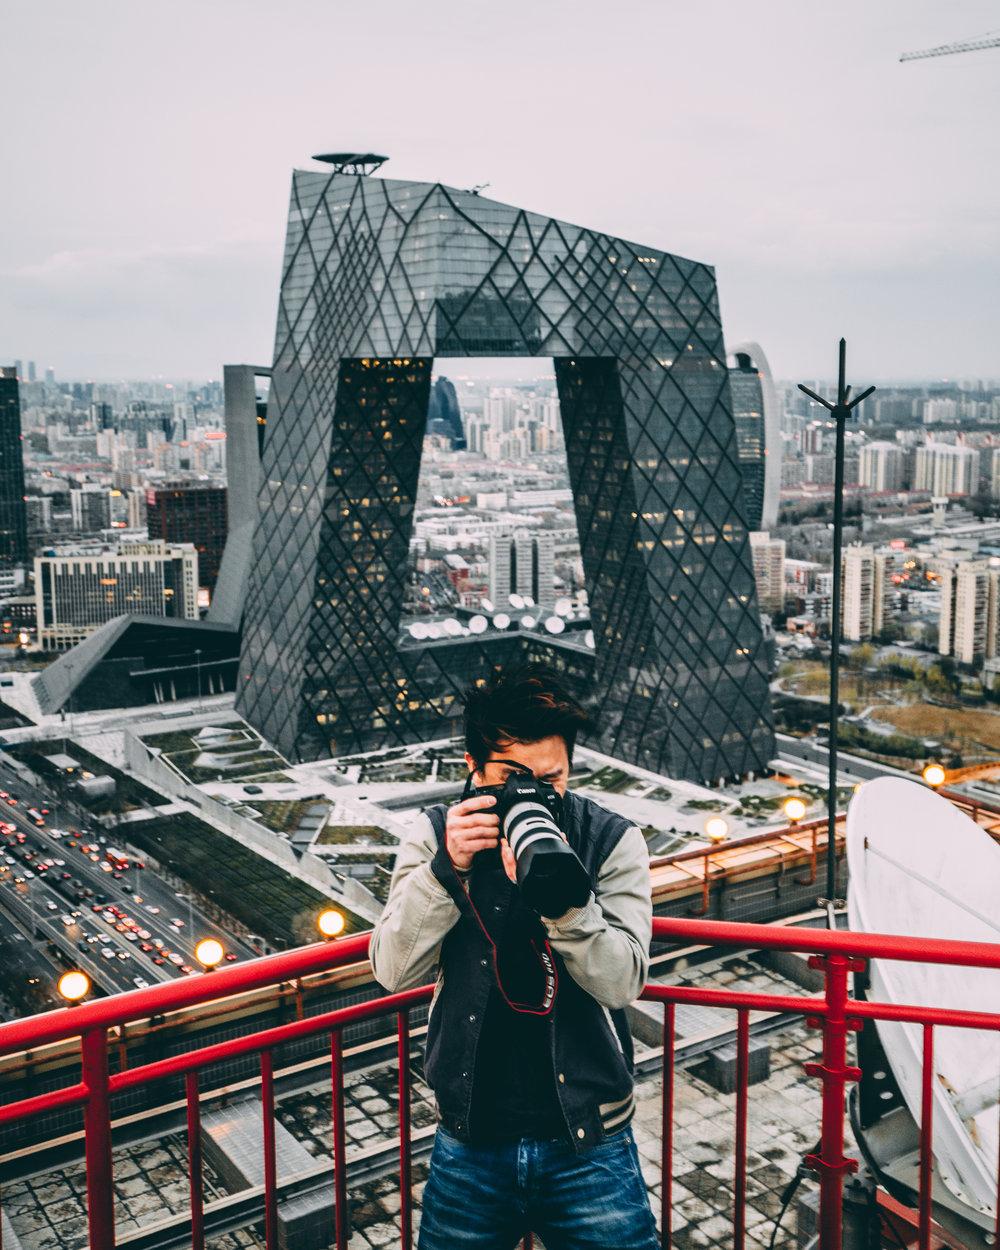 raj-eiamworakul-rooftop-profile-picture.jpg